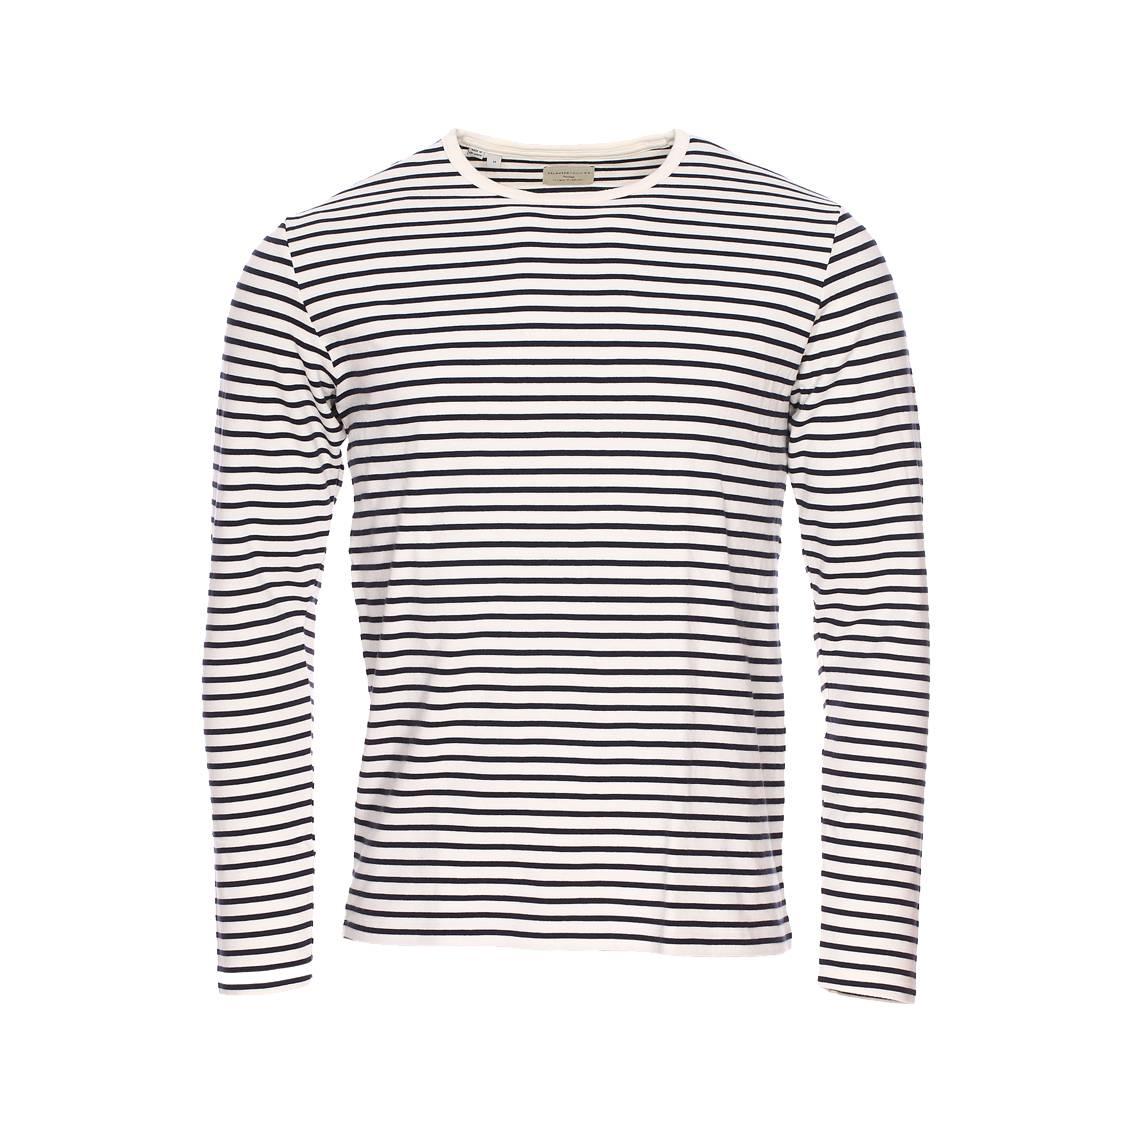 34442b68fe7 Tee-shirt manches longues Selected en coton crème à rayures bleu marine ...